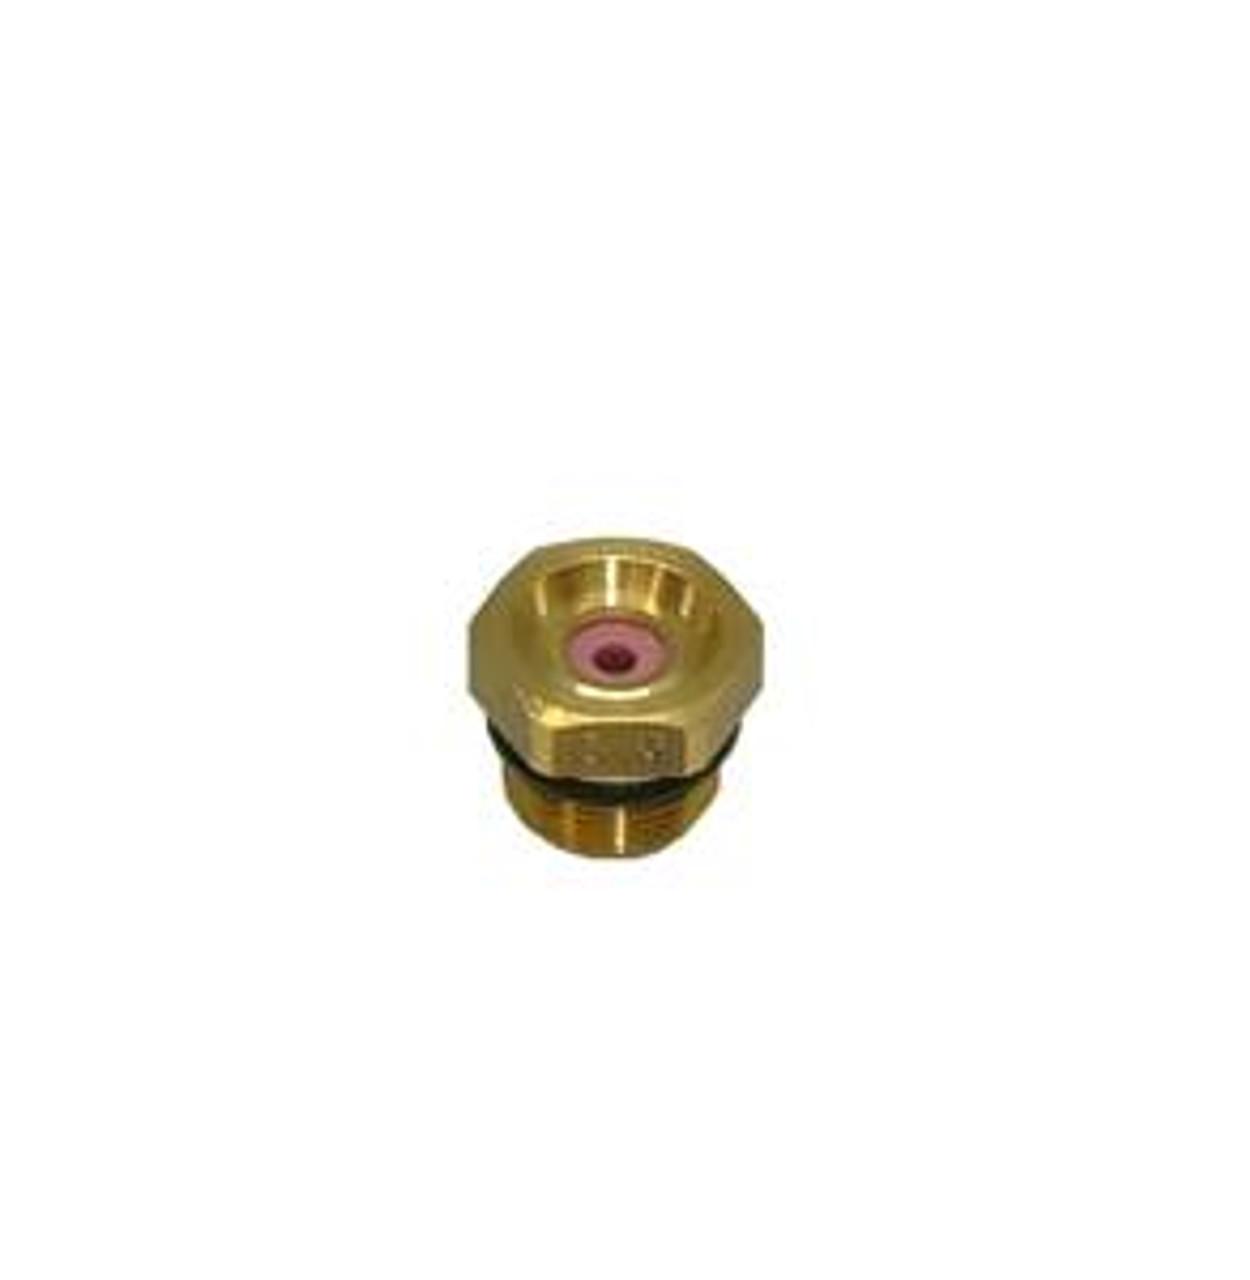 Nozzle for Turbo 400 gun - 1.5mm ceramic